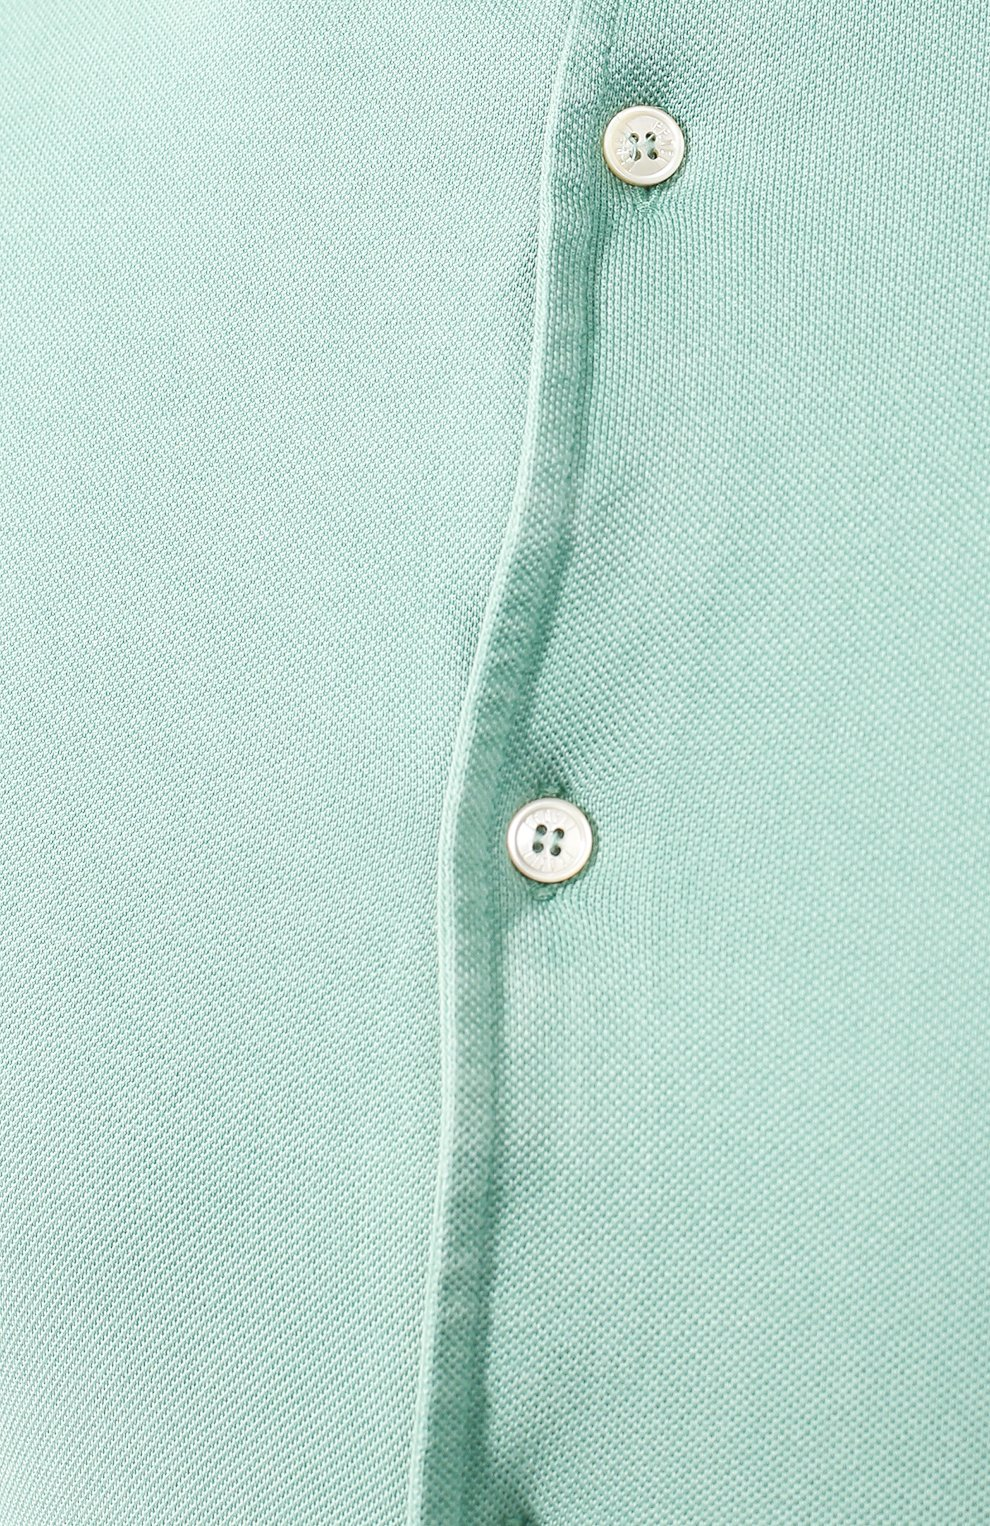 Хлопковая рубашка Fedeli светло-зеленая | Фото №5